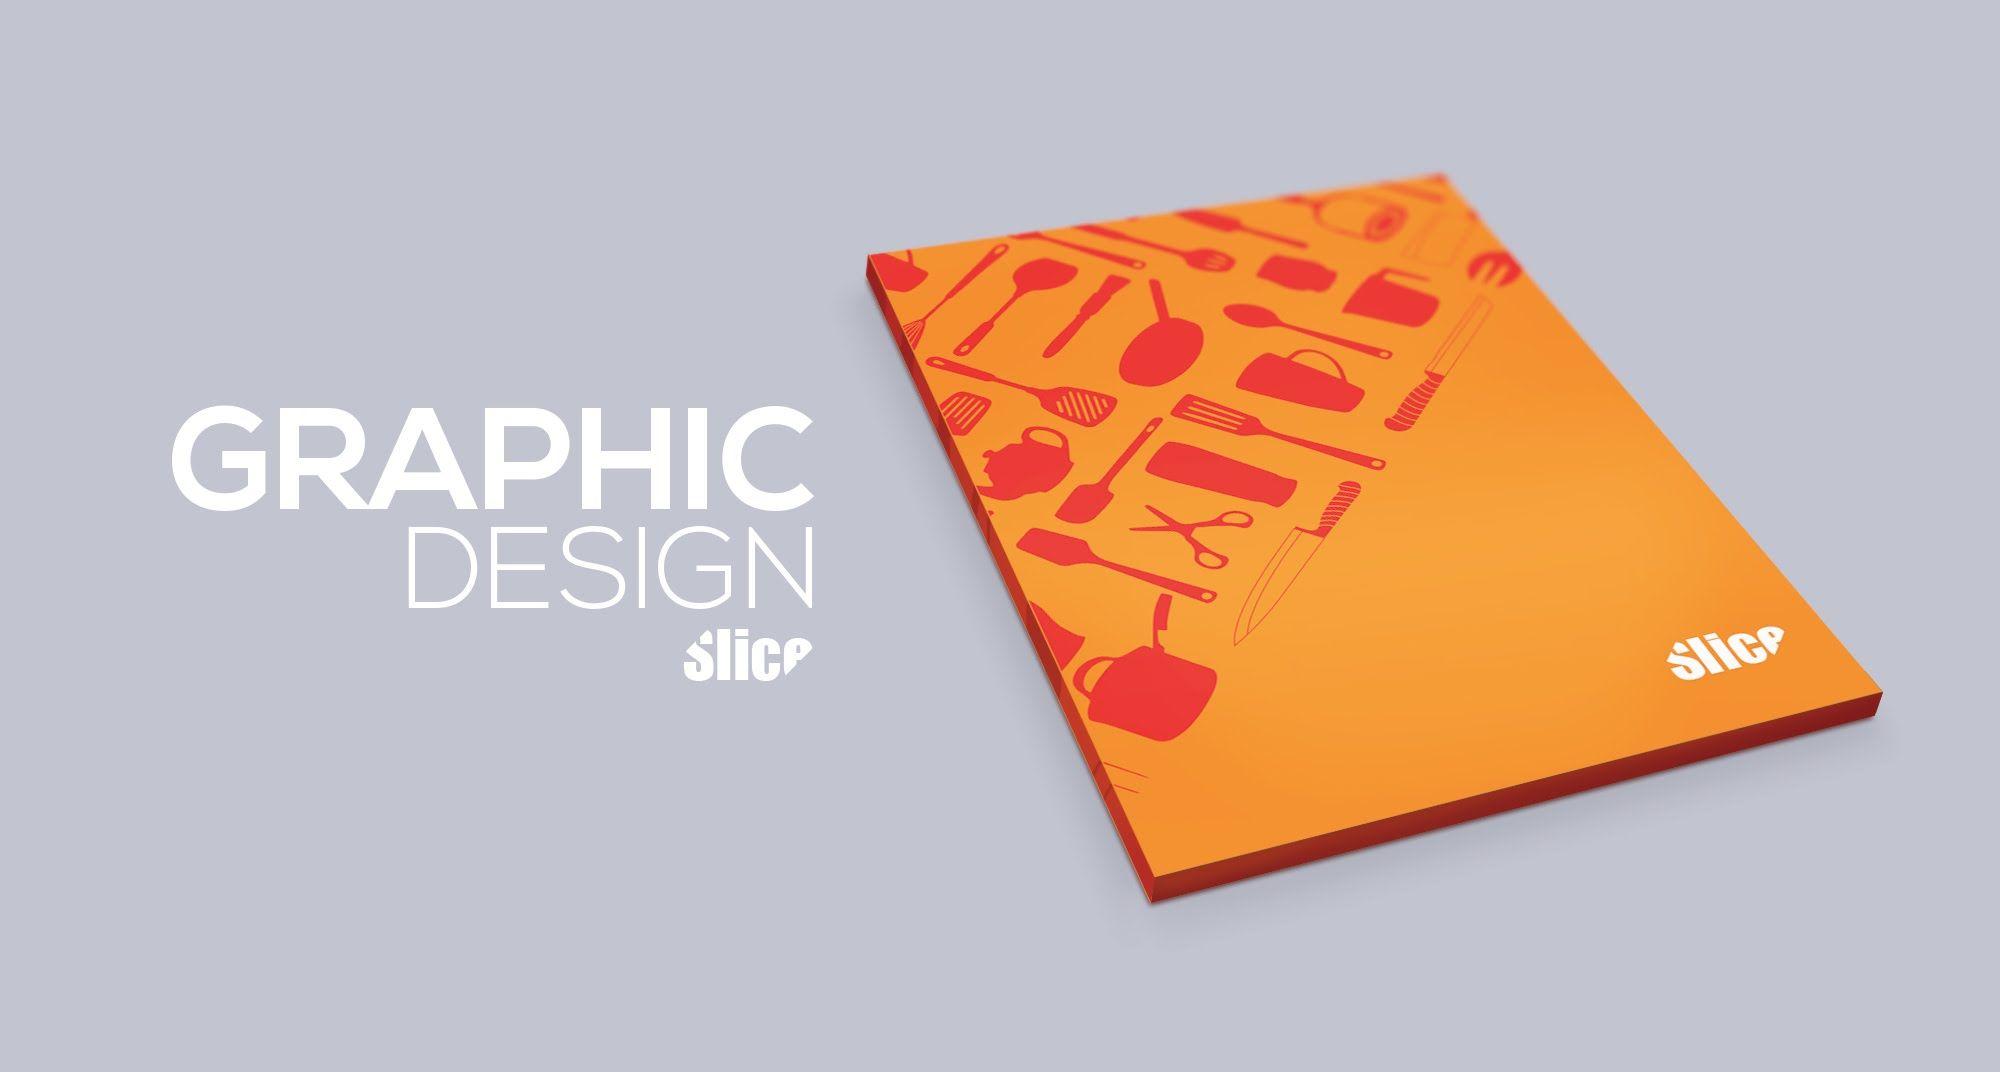 Graphic design adobe illustratorphotoshop slice part 2 graphic design adobe illustratorphotoshop slice part 2 baditri Image collections